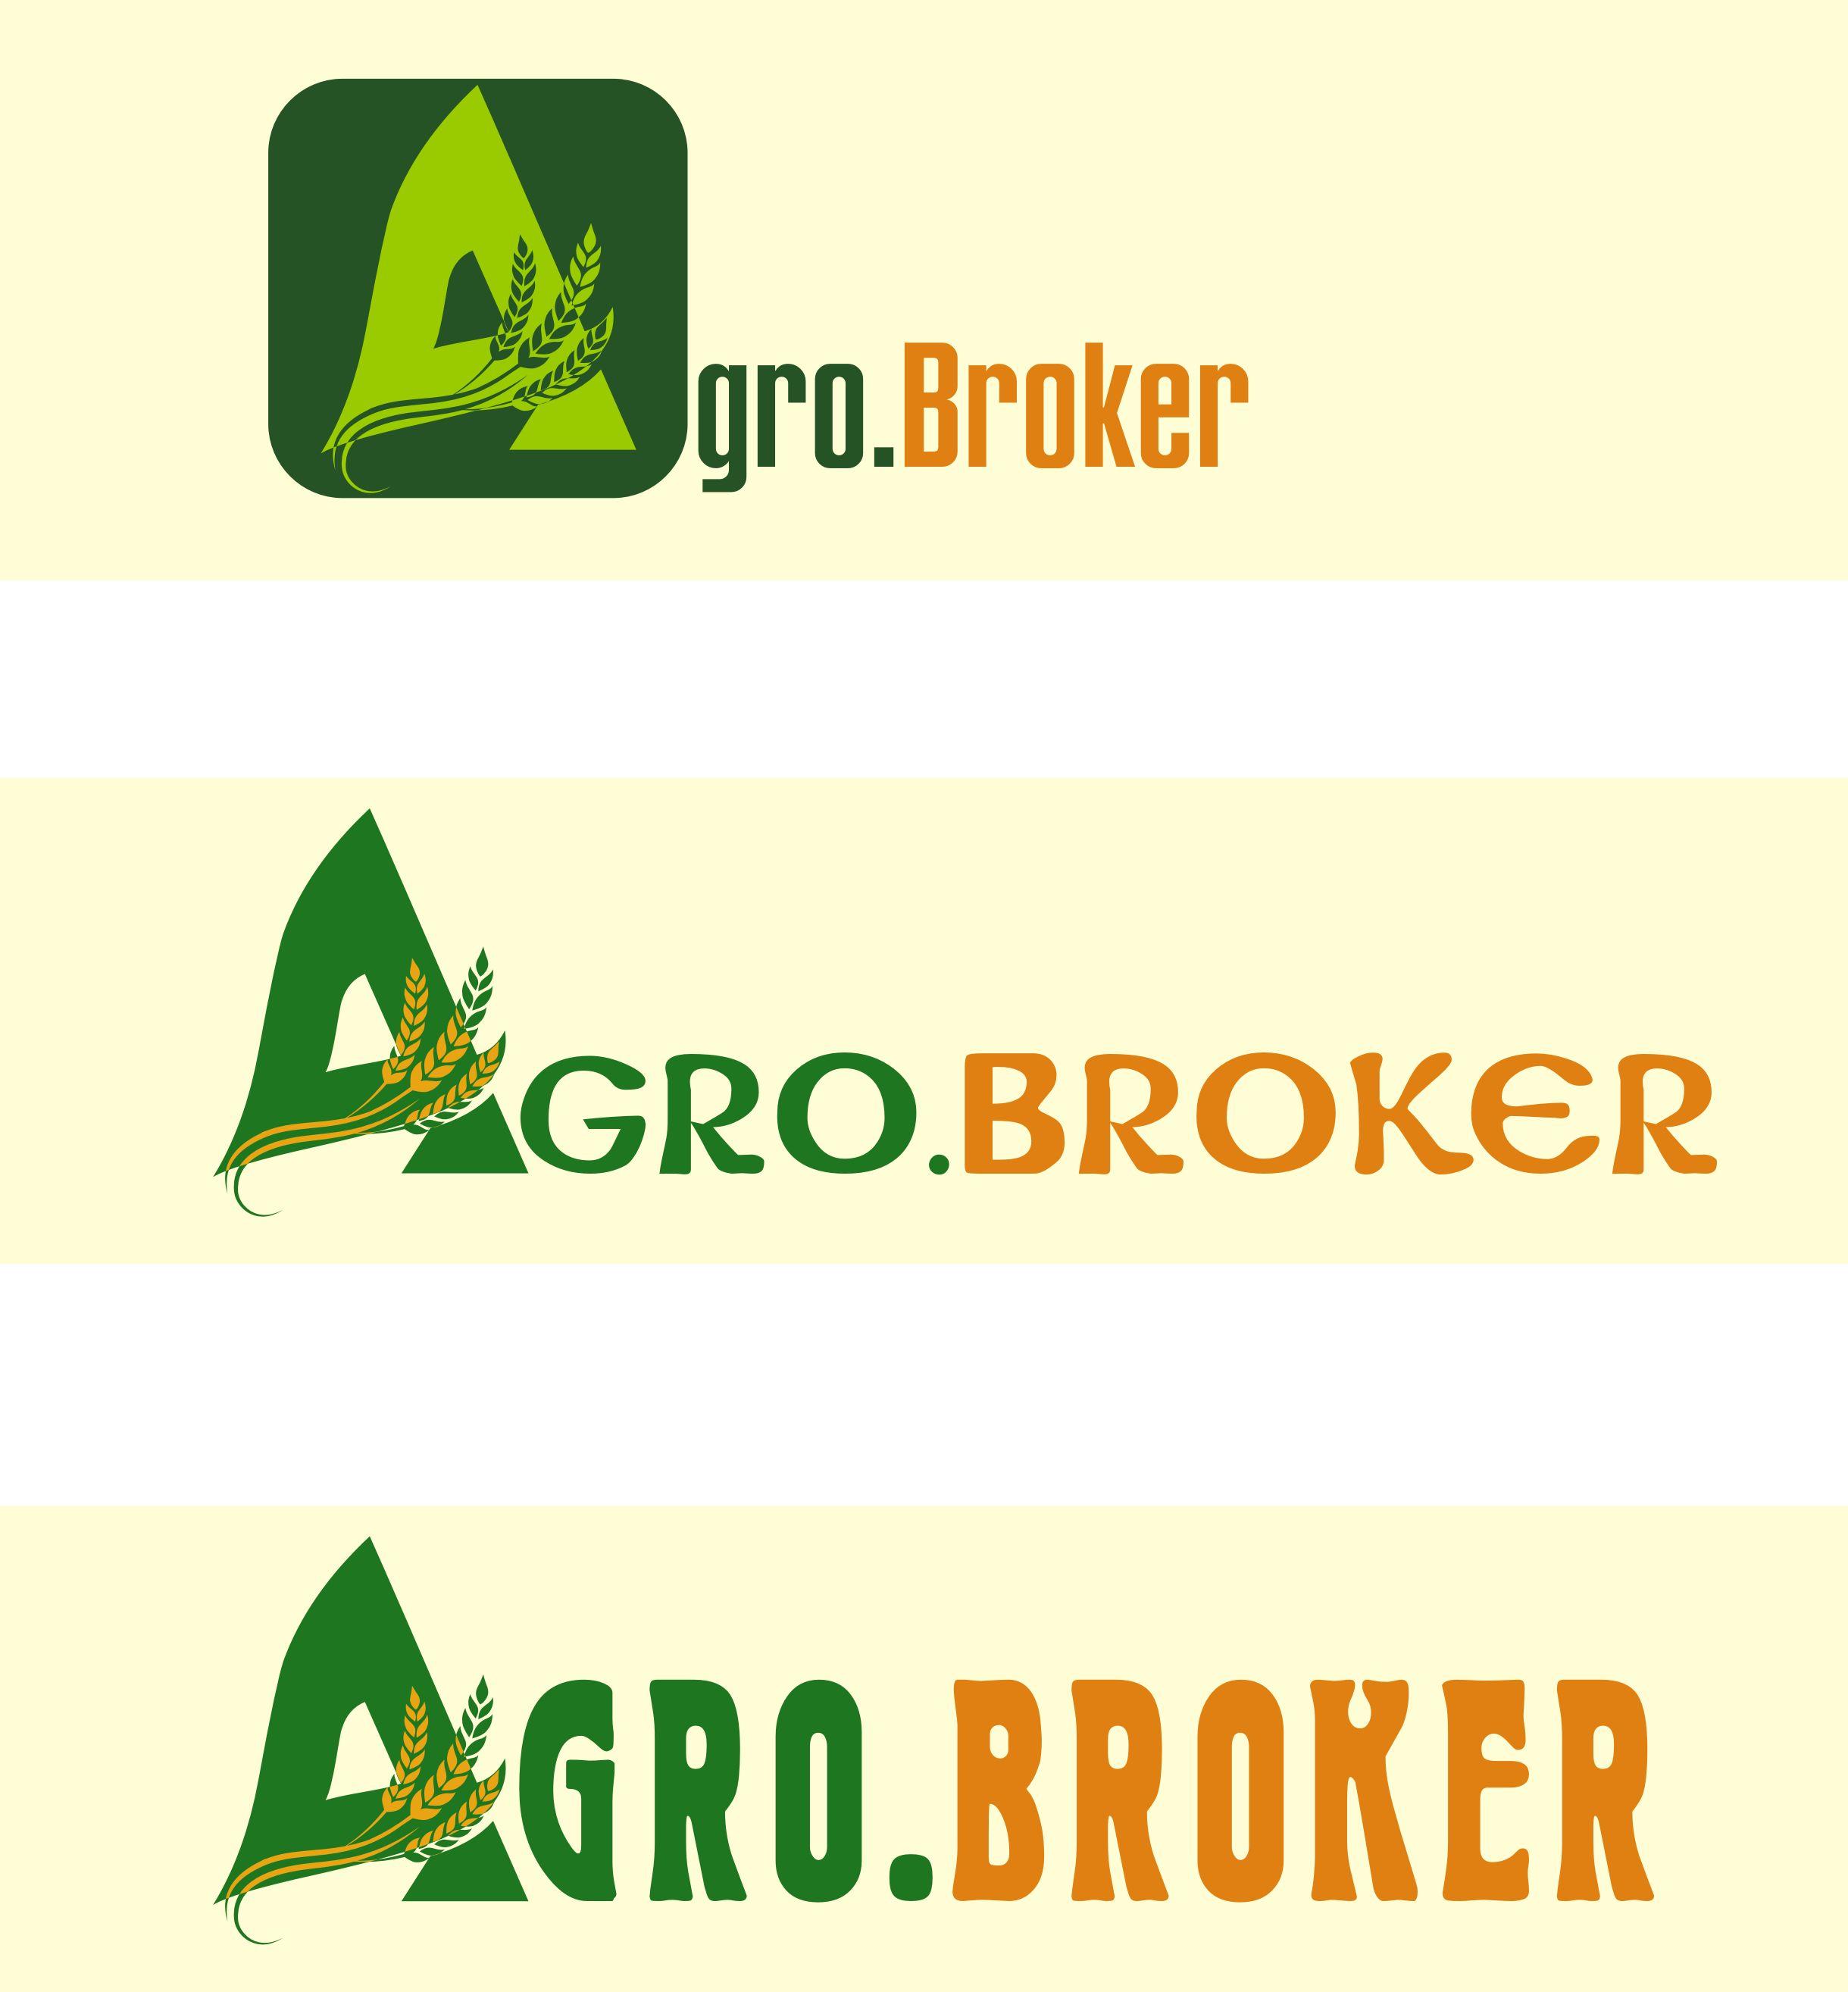 ТЗ на разработку пакета айдентики Agro.Broker фото f_350596cb88dcbd82.jpg